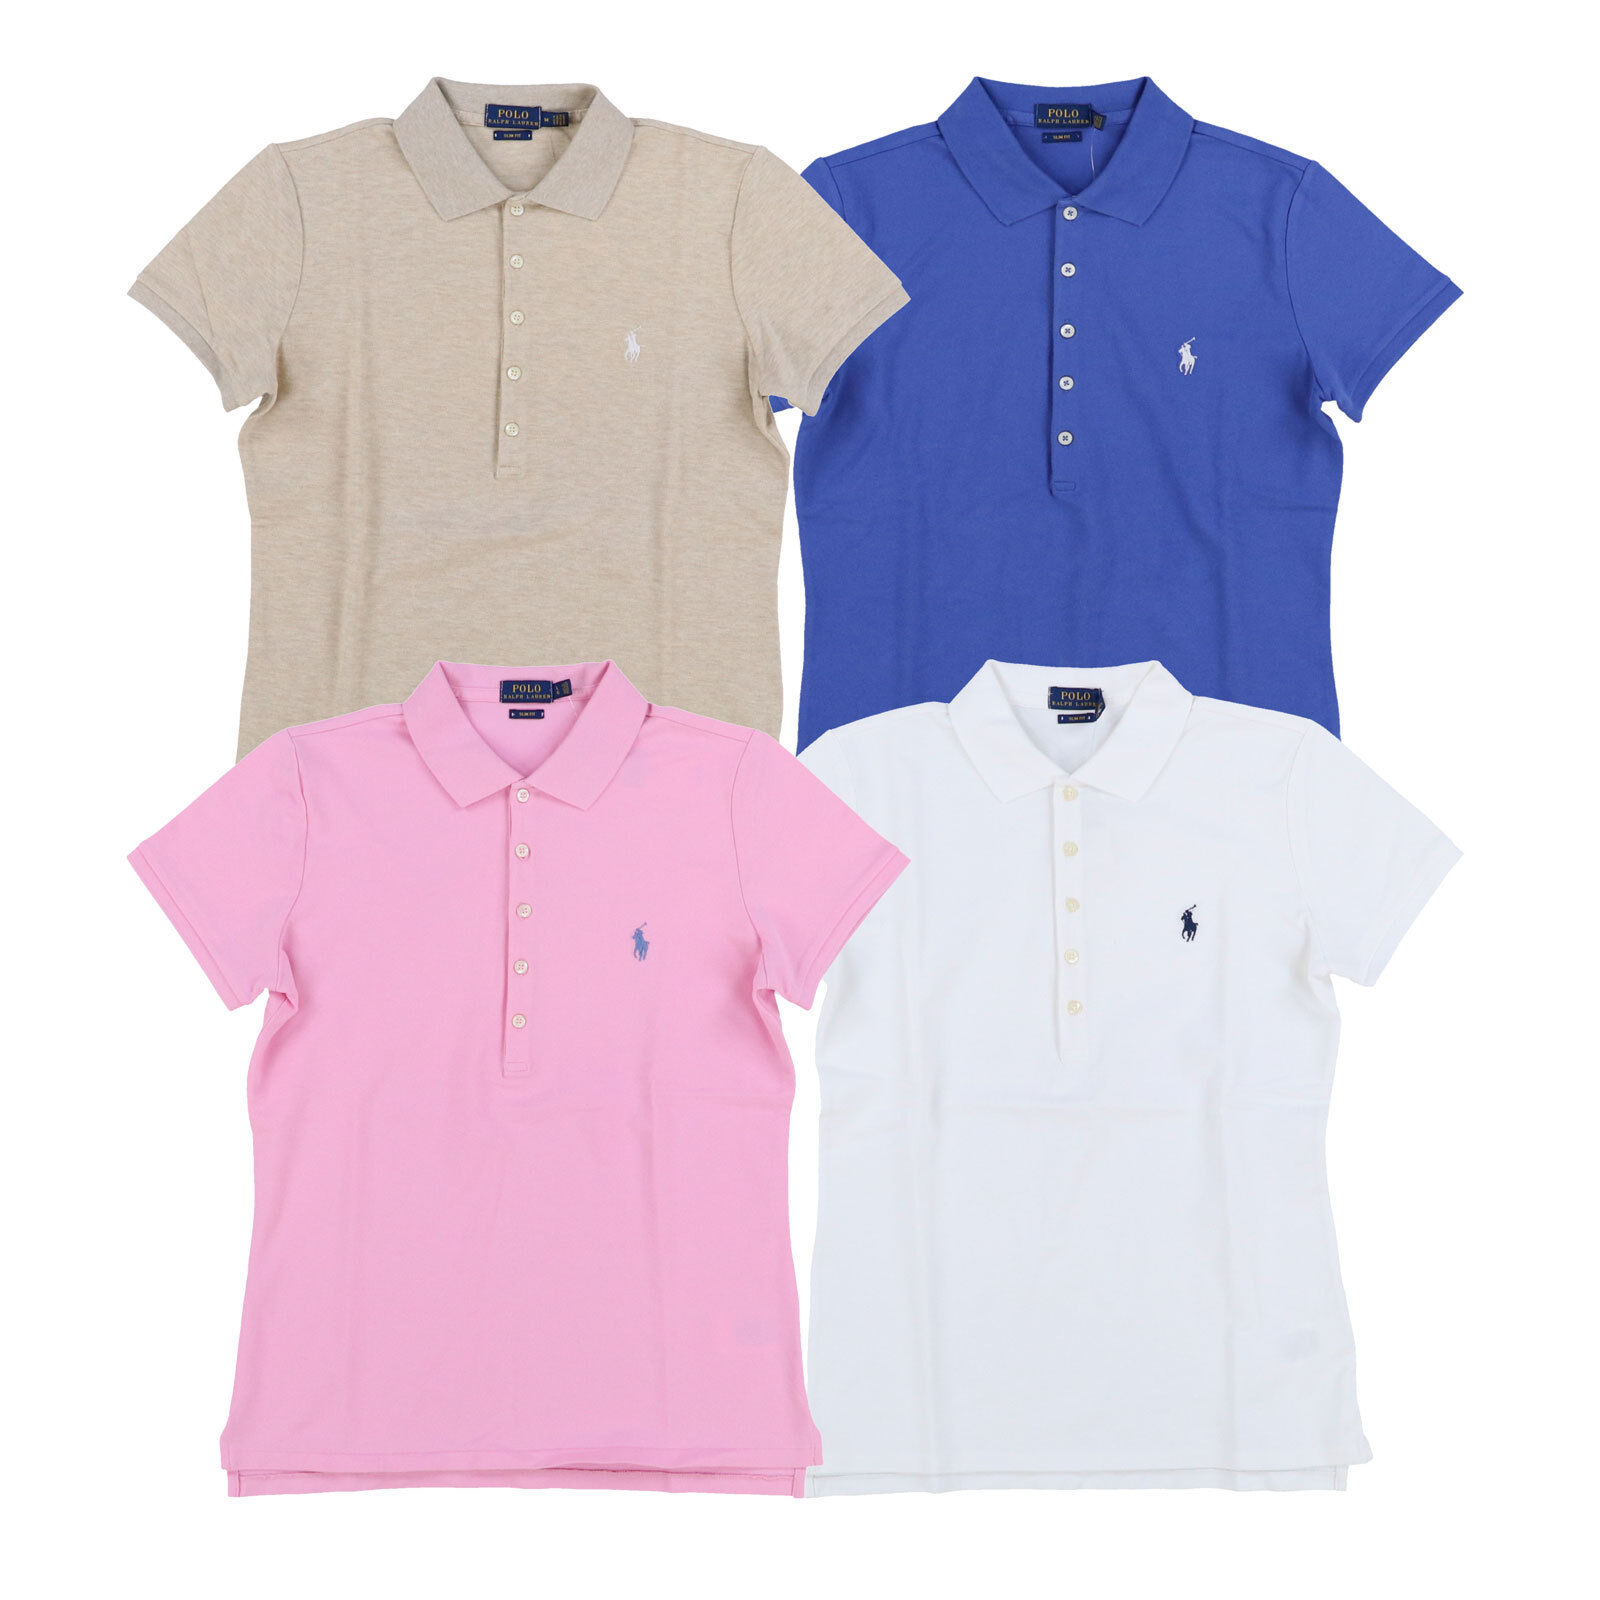 Polo Ralph Lauren damen Polo Shirt Slim Fit Stretch Mesh Collarot Xs S M L Xl